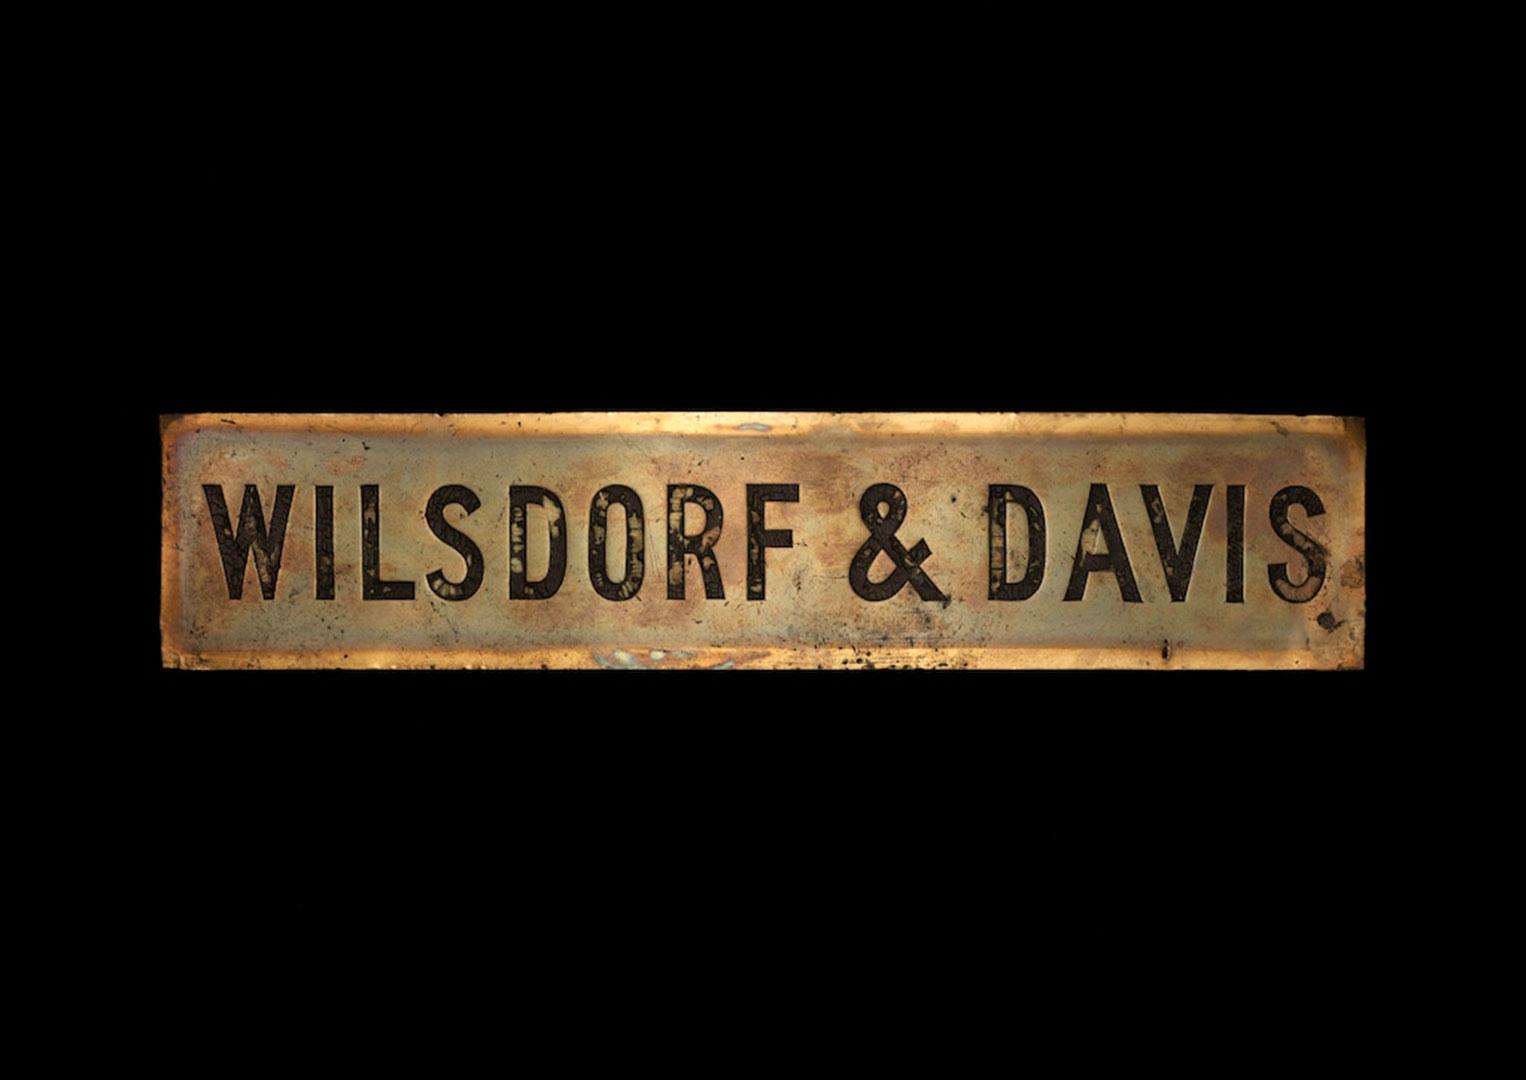 The Wilsdorf & Davis nameplate in London, 1905